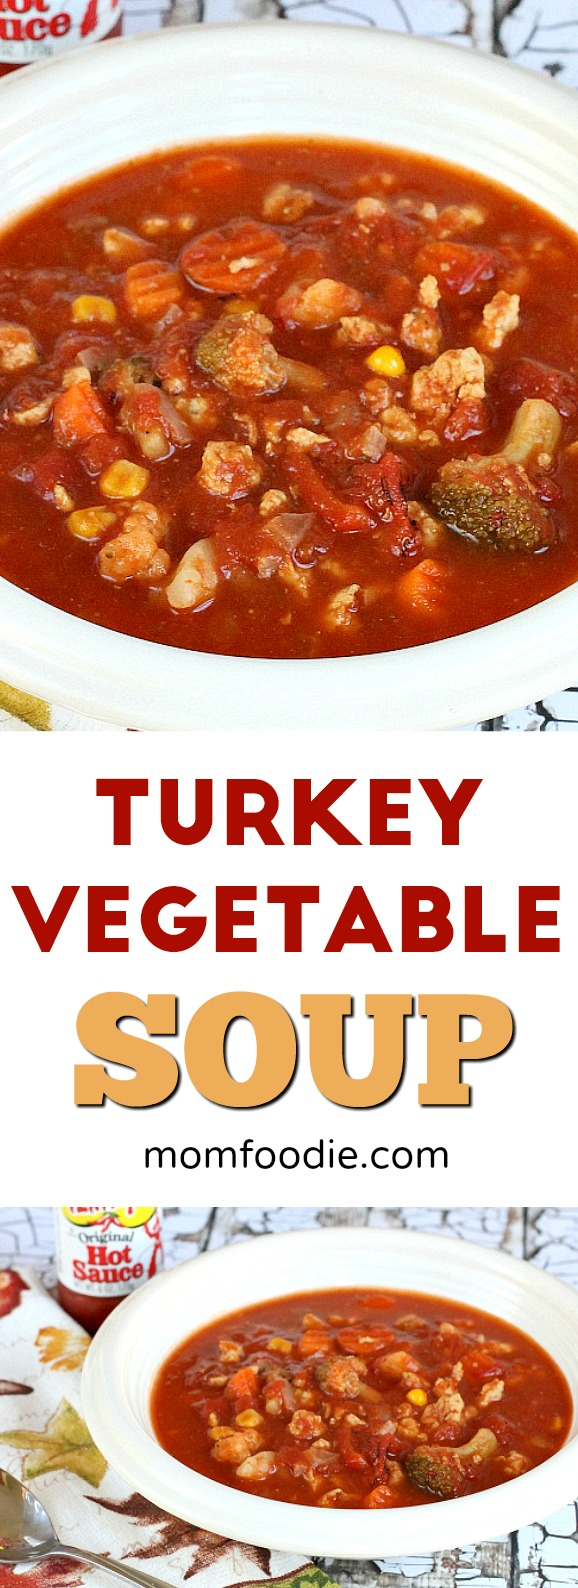 Turkey Vegetable Soup - Easy low calorie turkey vegetable soup recipe. Make it with ground turkey or leftovers.